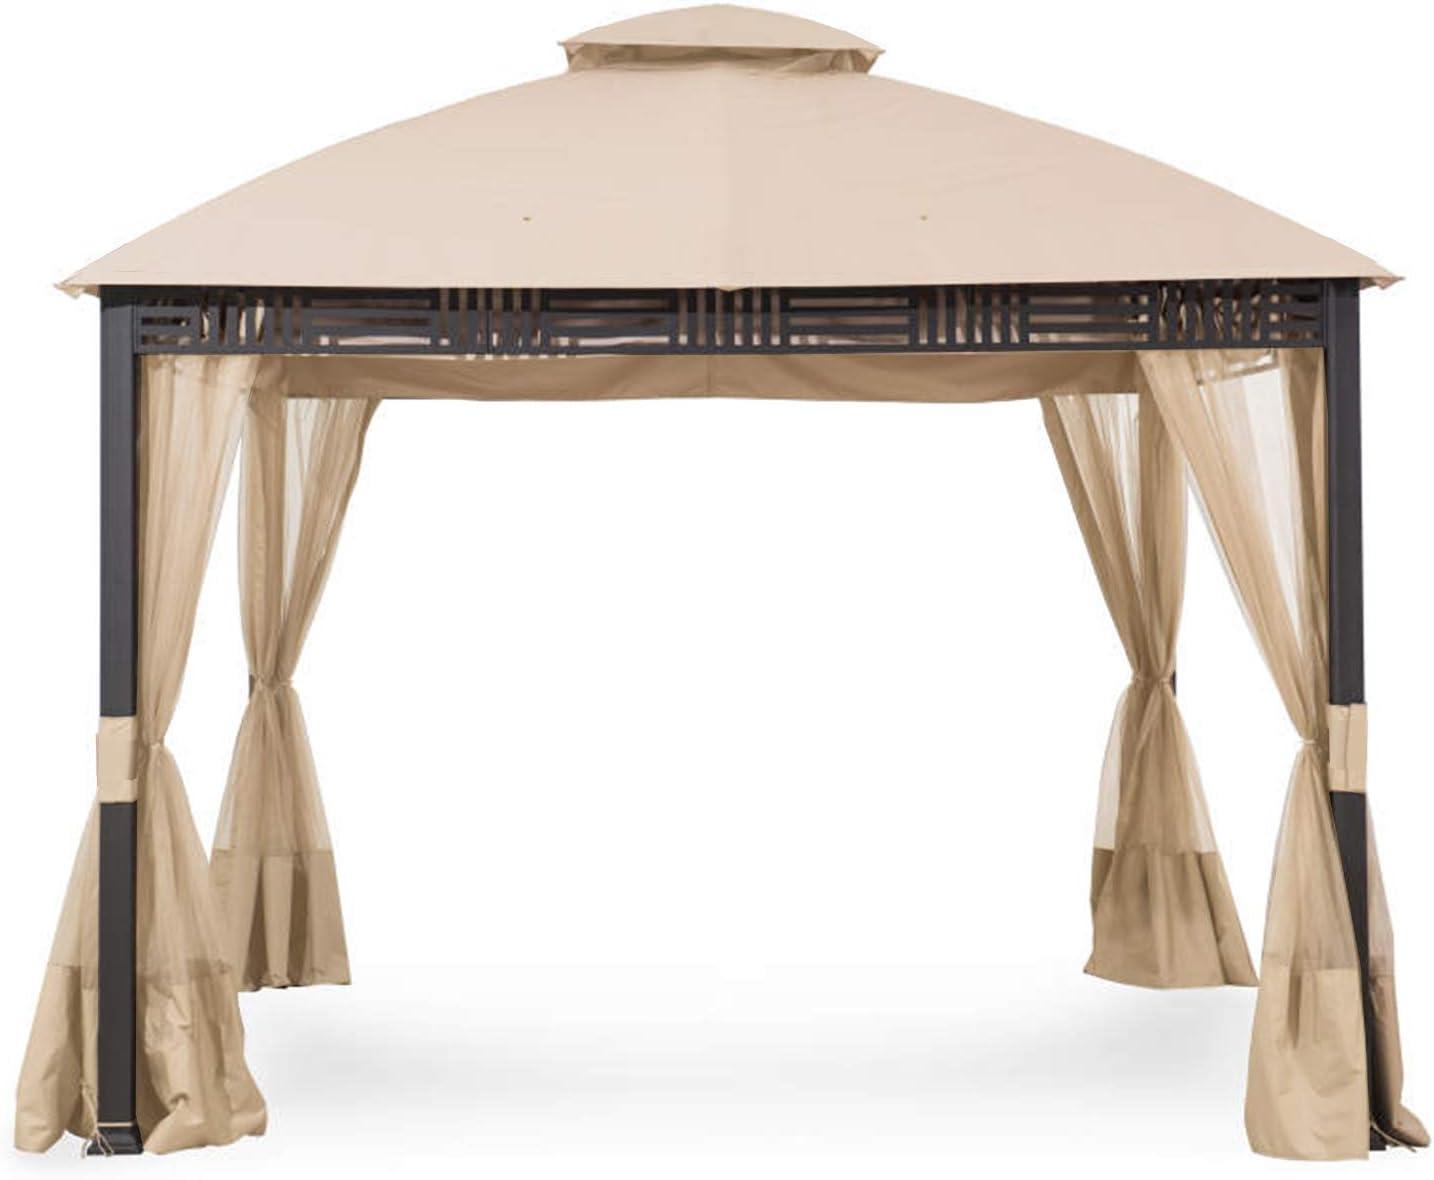 Garden Winds Replacement Canopy Top Cover for Westbrook Gazebo Gazebo - 350 - Beige